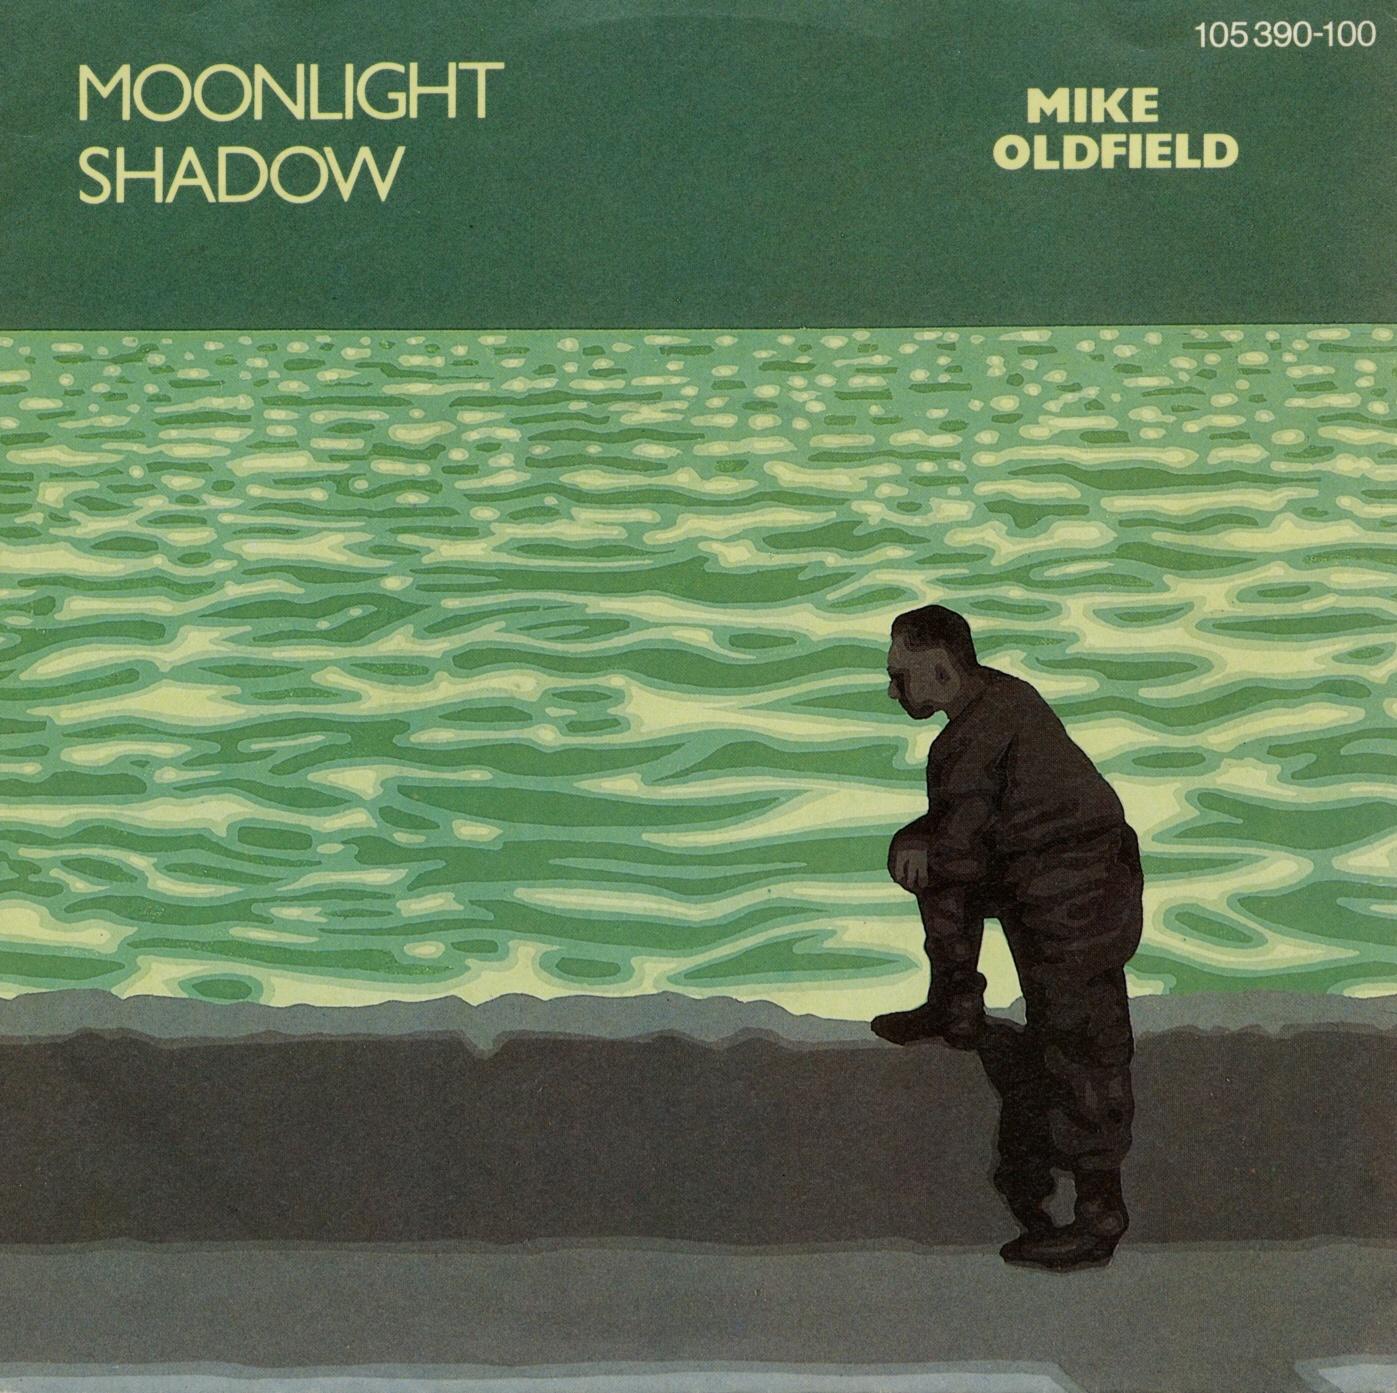 Moonlight shadow (Foto: Mike Oldfield)